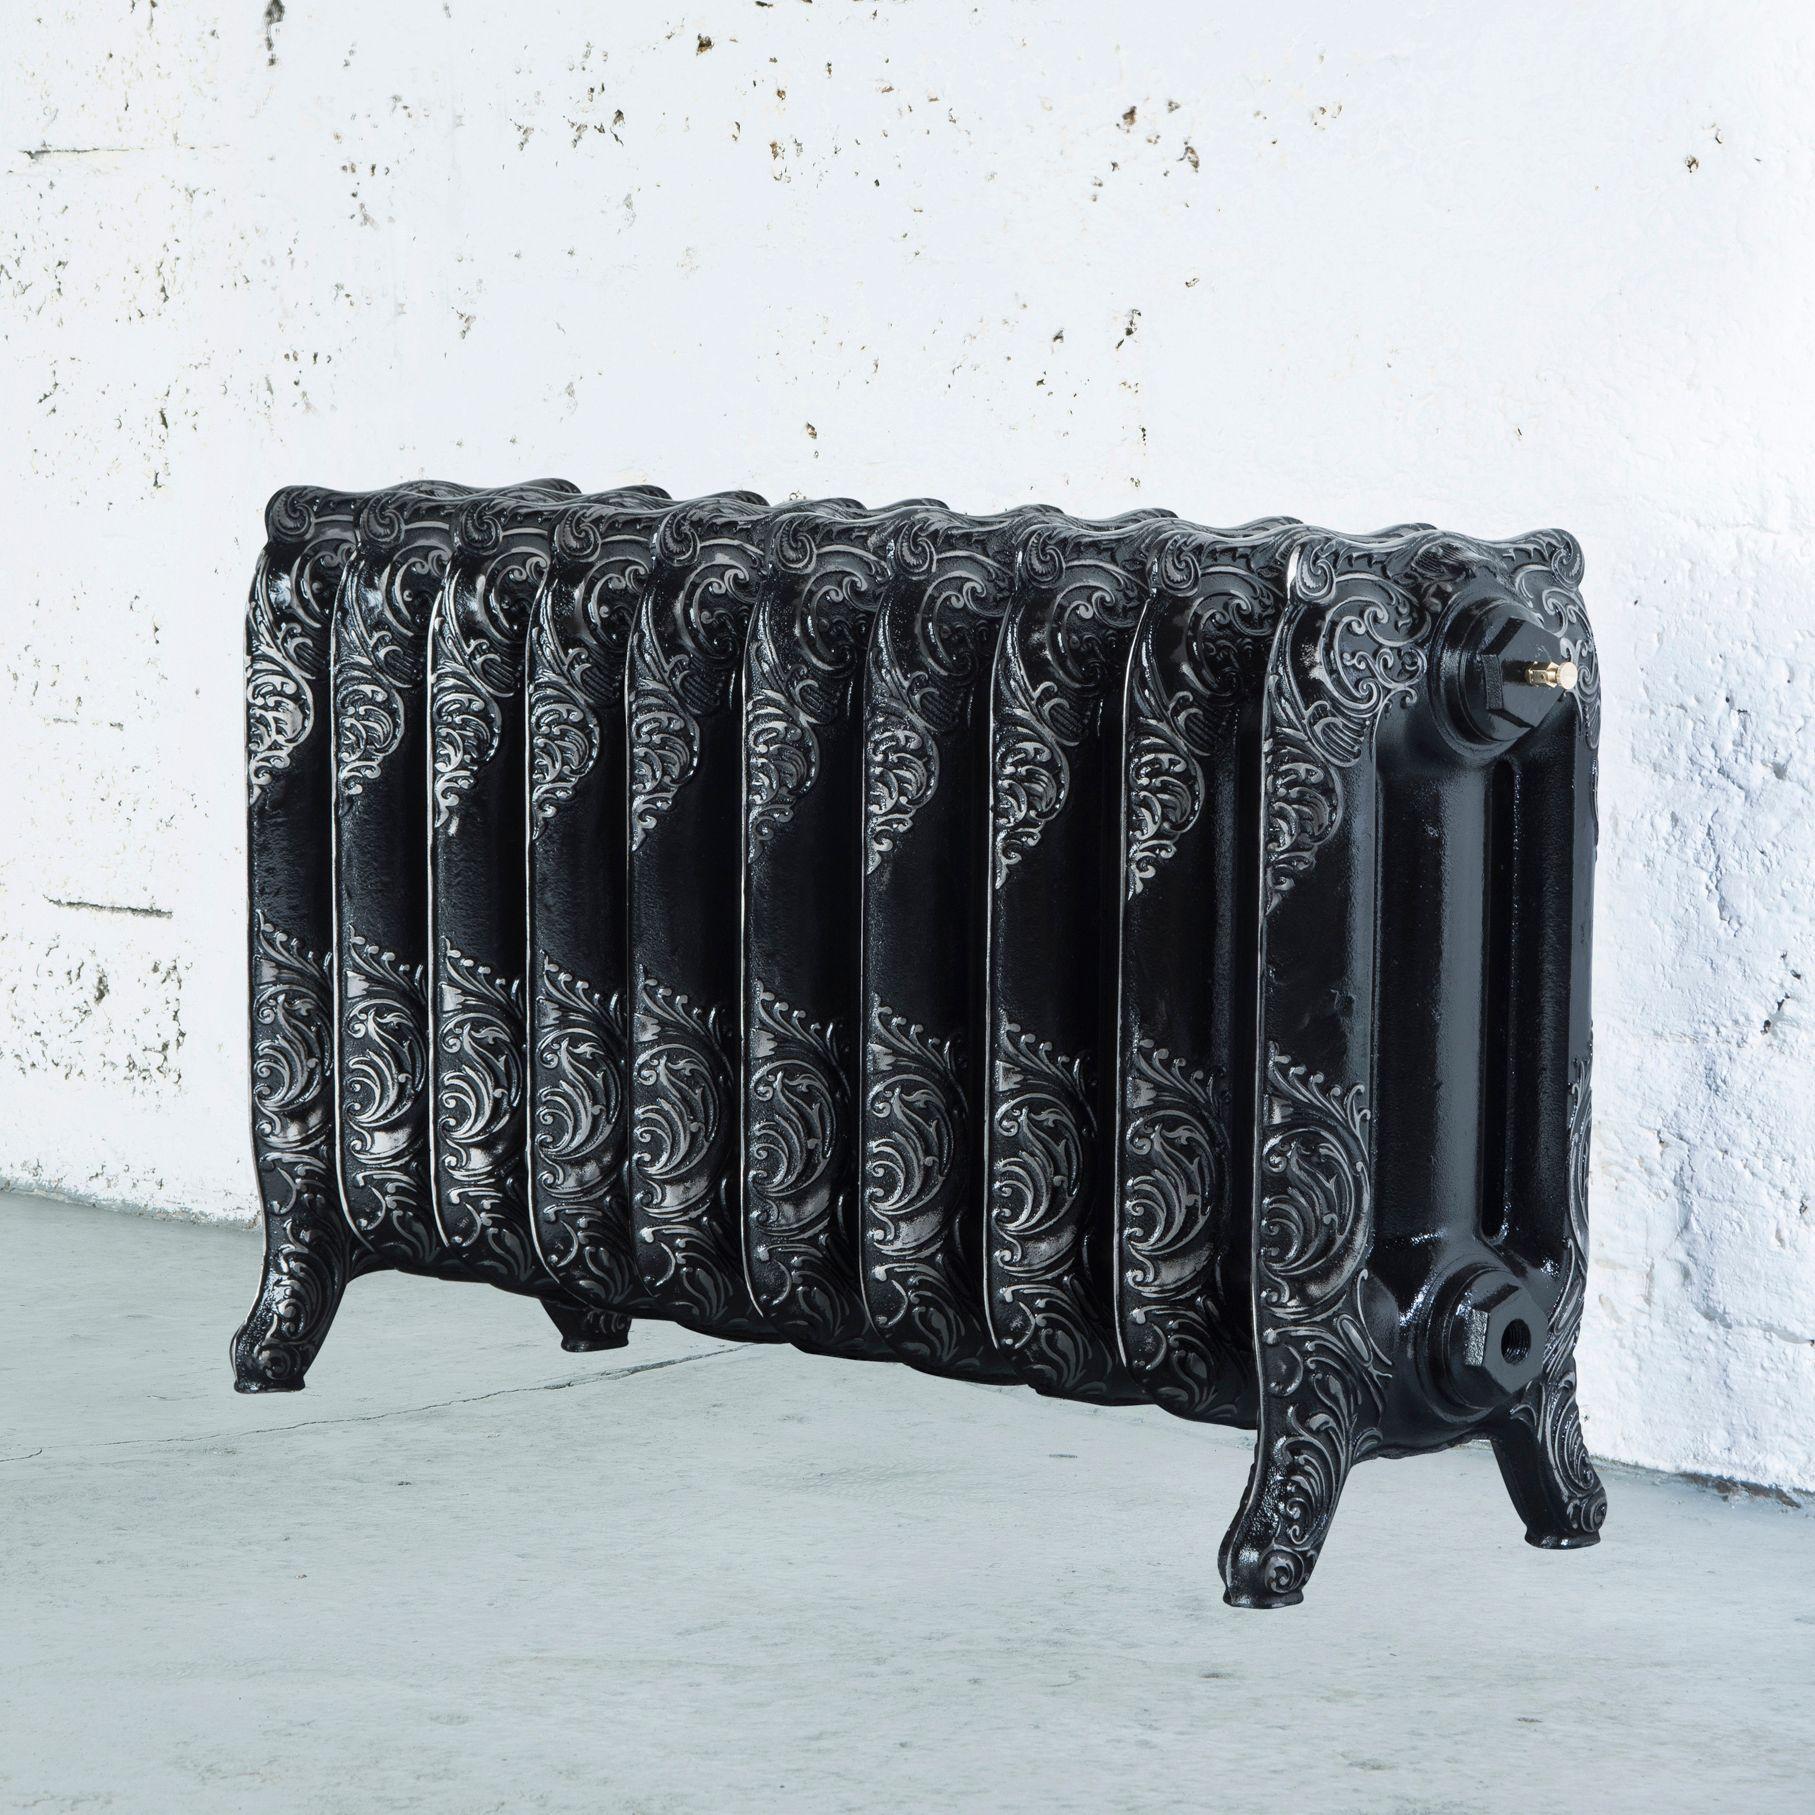 Arroll Montmartre 3 Column radiator, Black & silver